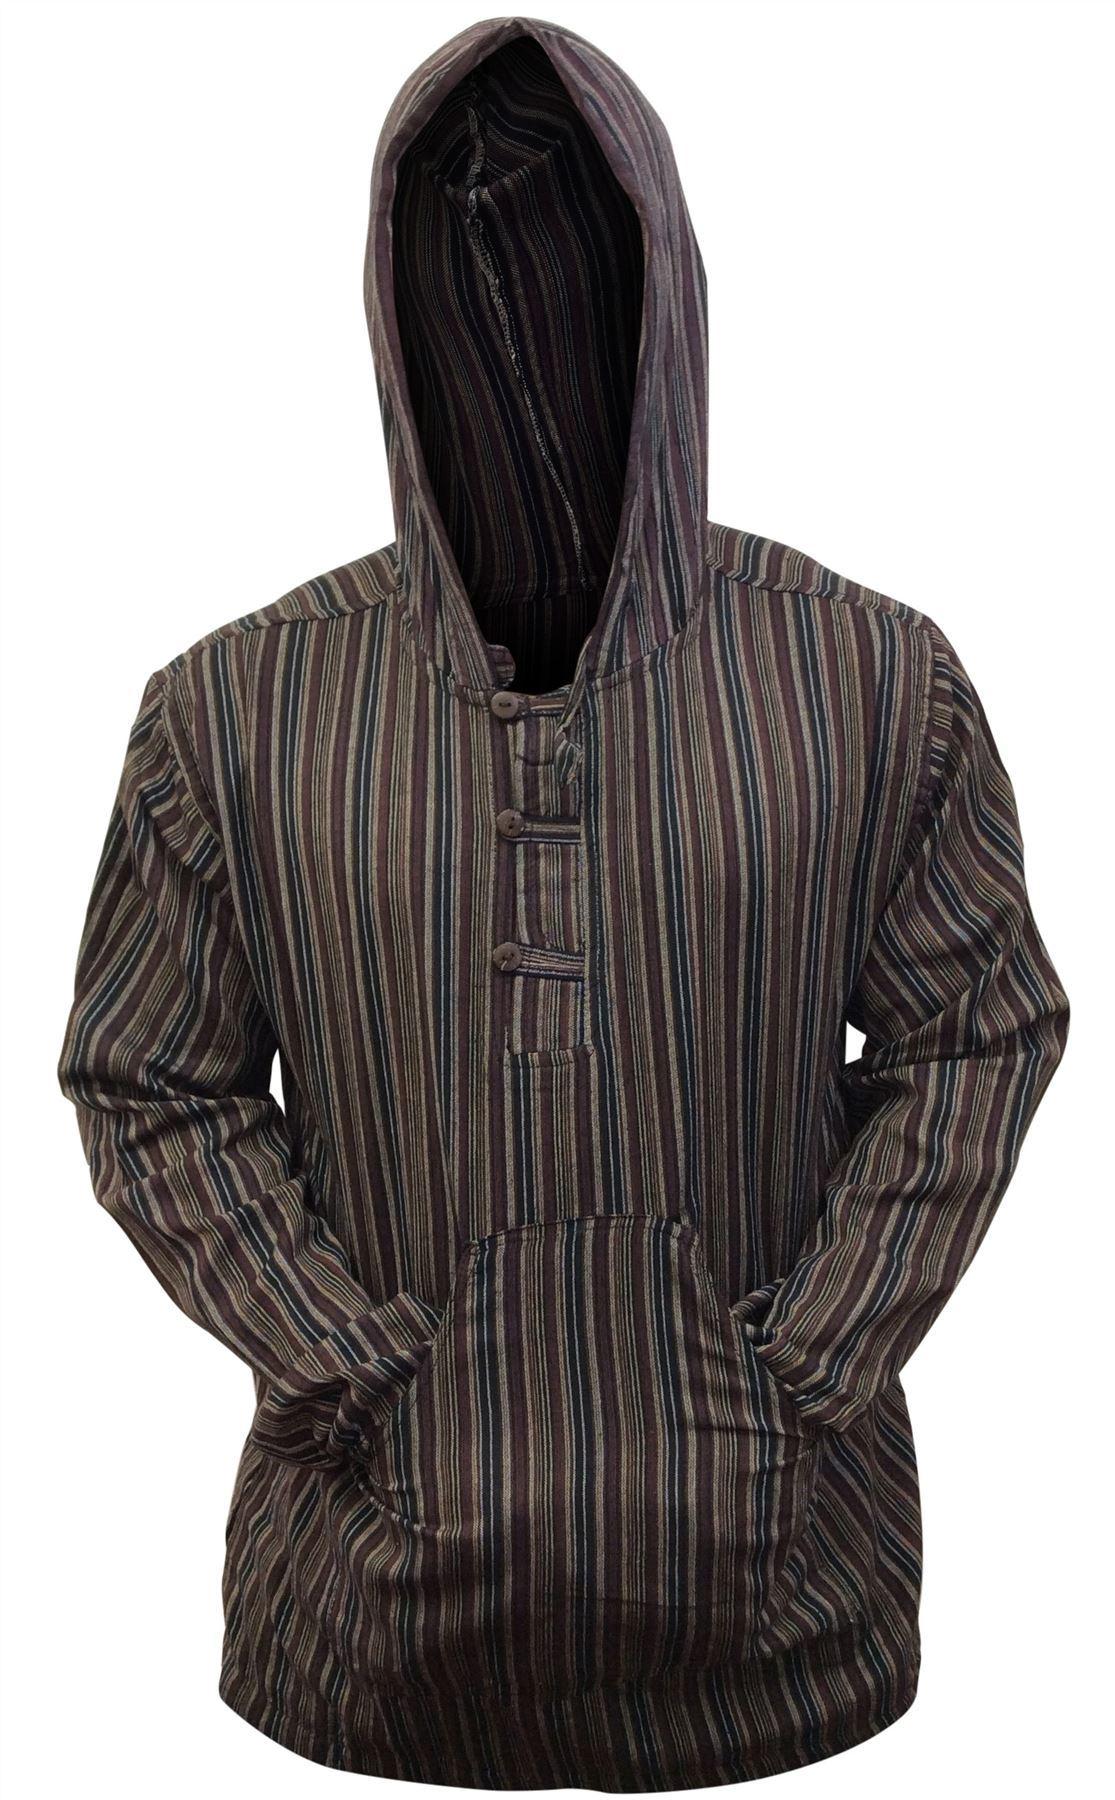 Men-039-s-Cotton-Grandad-Shirt-Full-Sleeved-Hippie-Top-Festival-Stripe-Hippy-Hoodie thumbnail 10